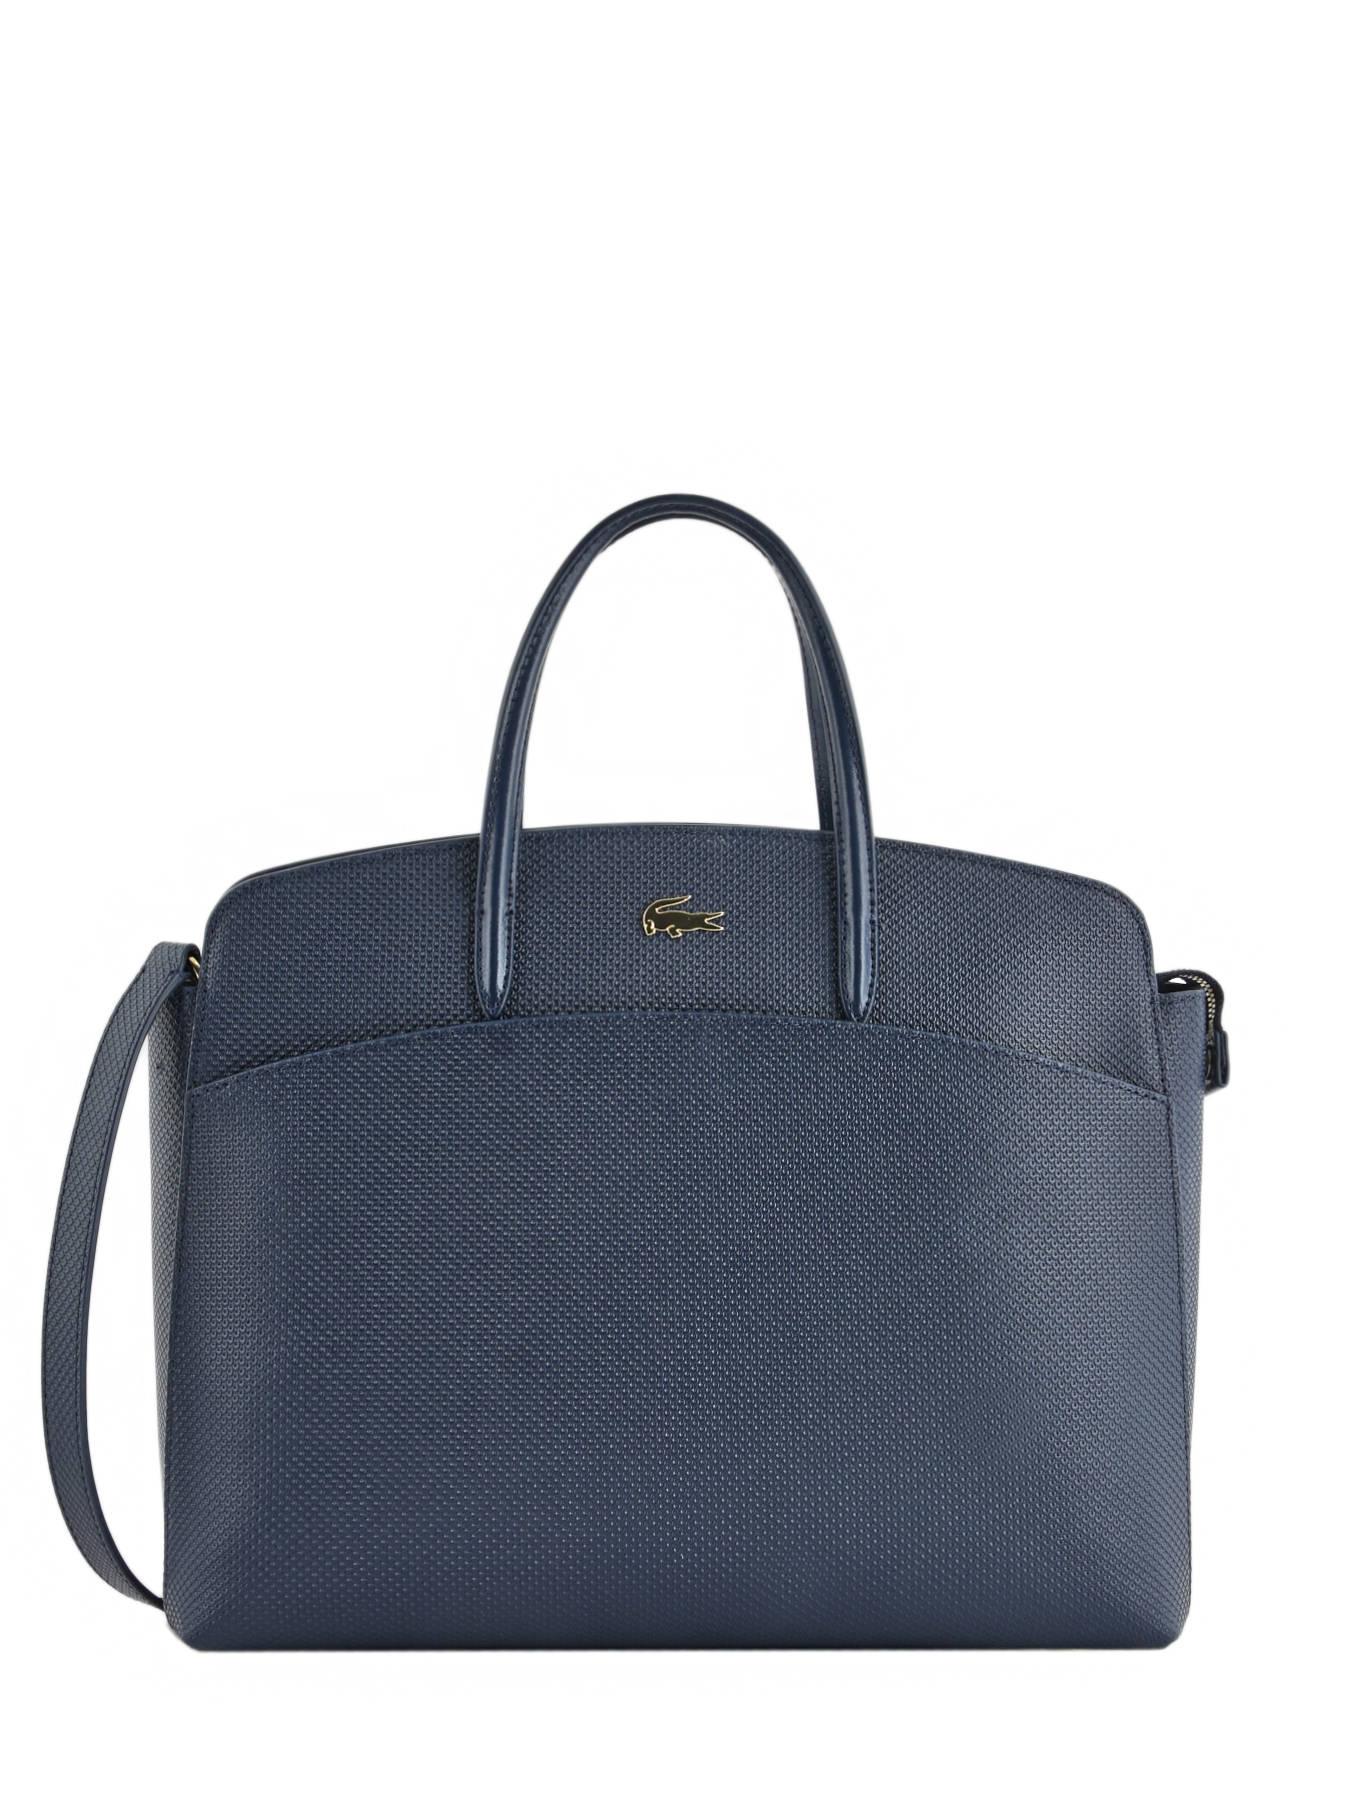 c5f7af75ad ... Top Handle Chantaco Leather Lacoste Blue chantaco NF2736CE ...